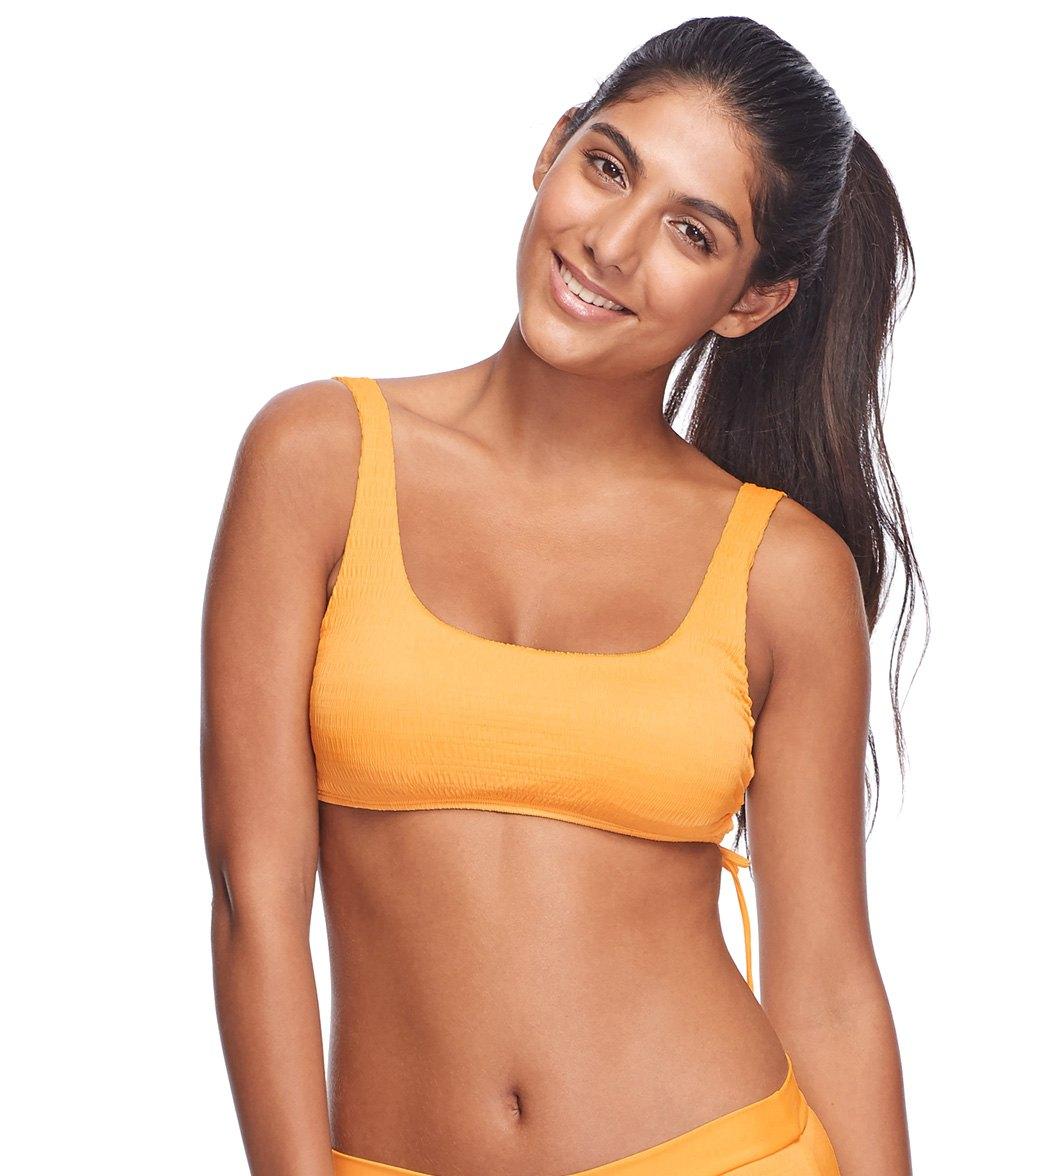 Body Glove Korcula Maxim Bikini Top